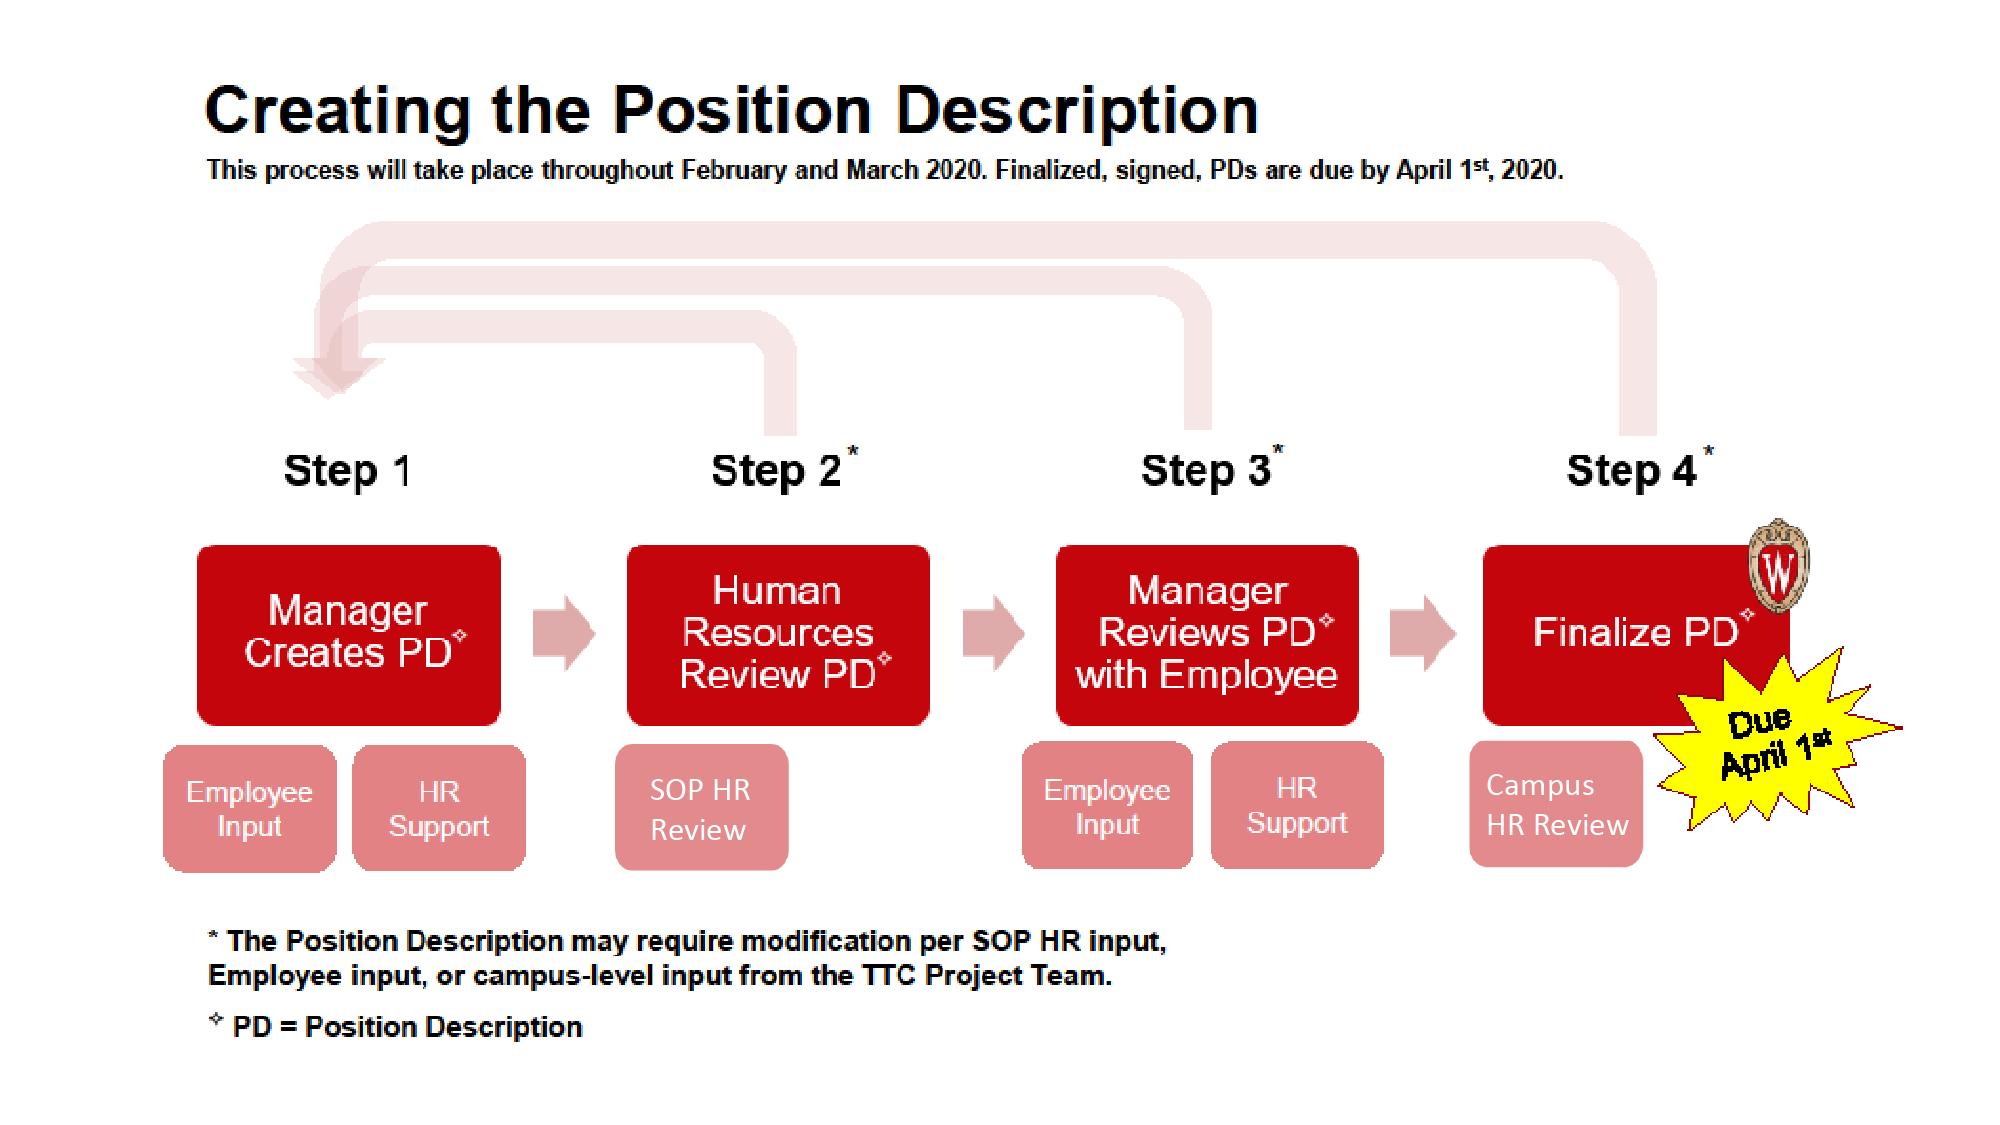 Workflow for creating Position Description